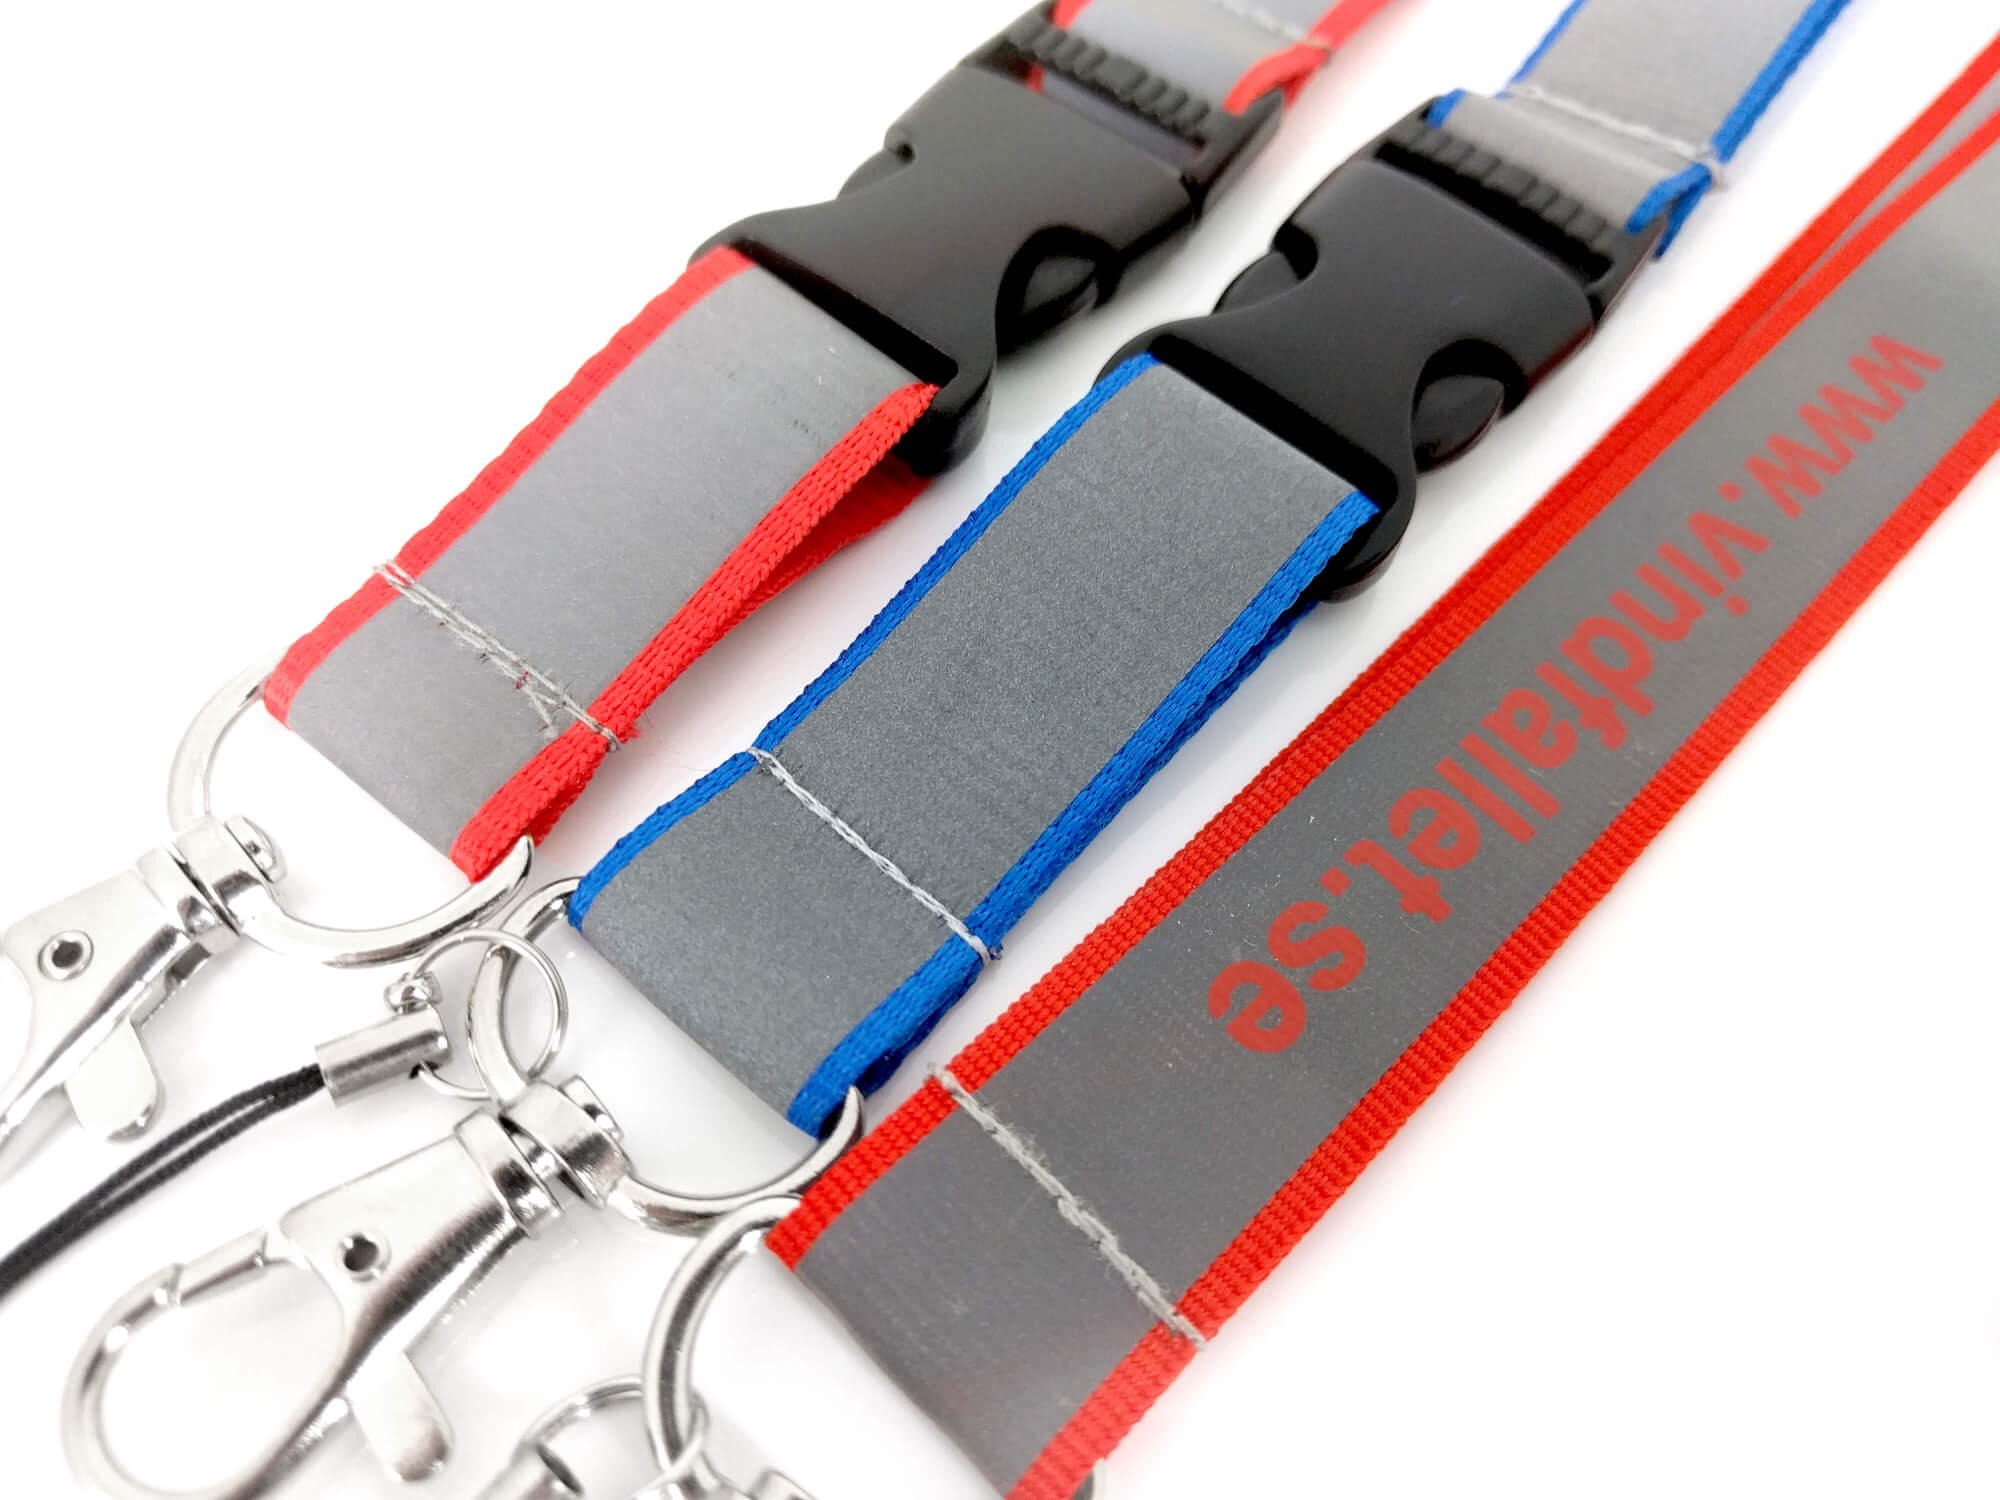 Nyckelband Reflex 20 mm med tryck - EASYTRYCK.se 34b7196d271bb